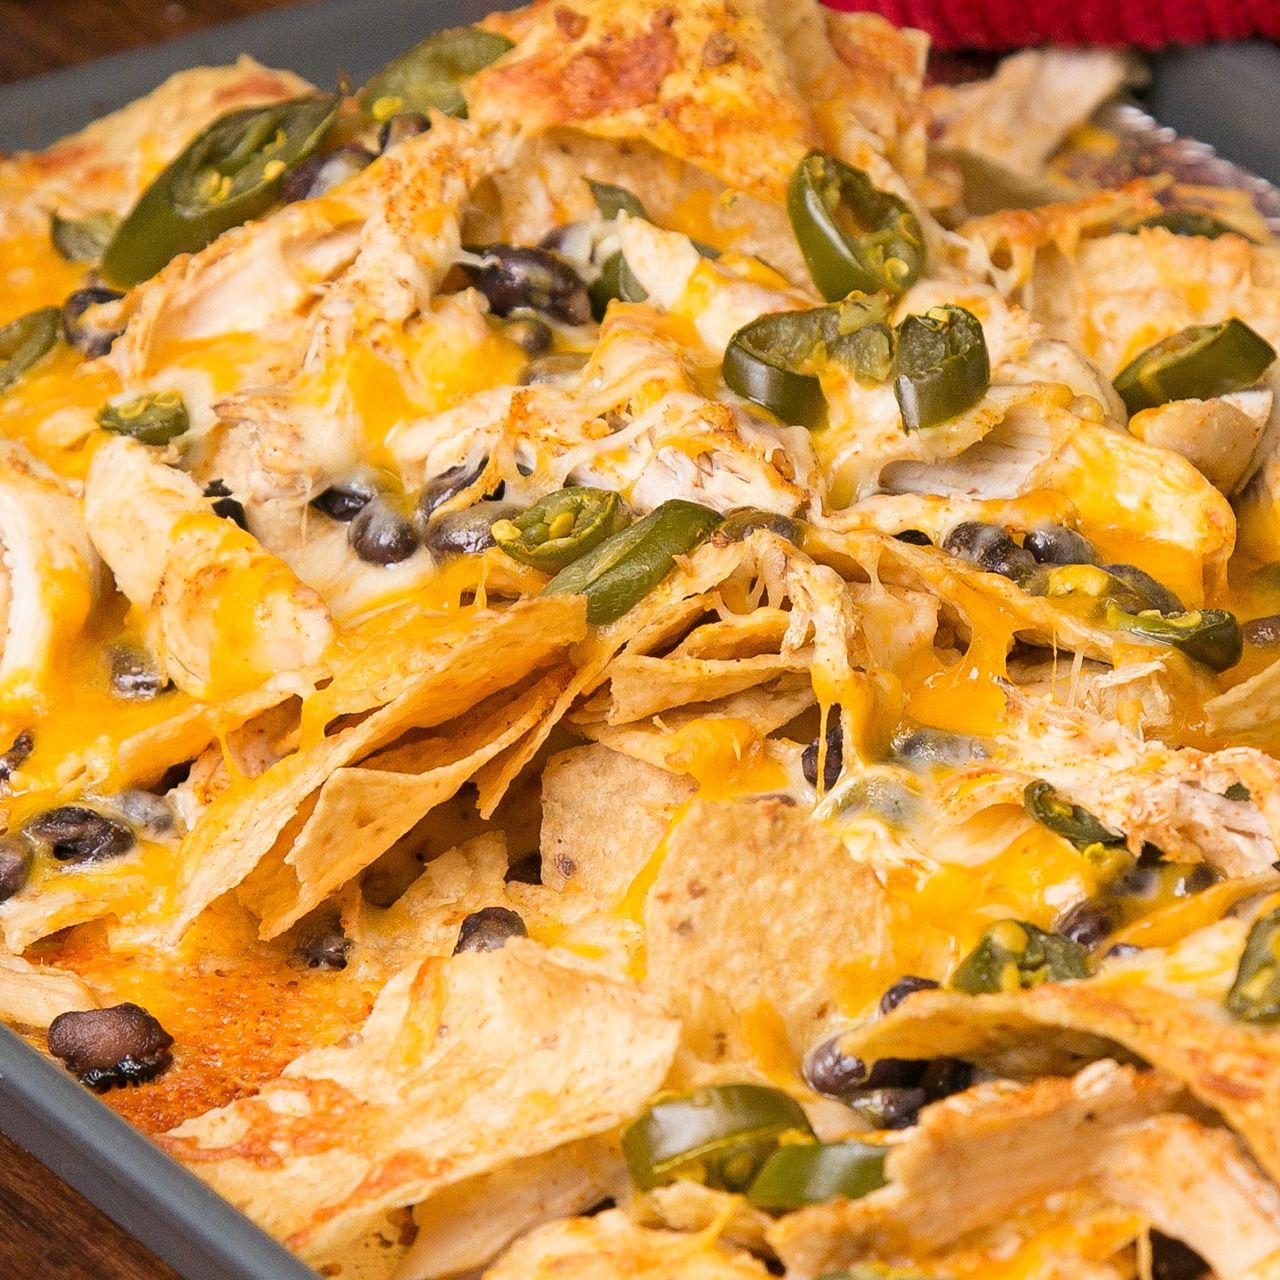 5 minute nachos recipe easy party snacks snacks and easy 5 minute nachos easy party snackstailgate foodtailgatingwestern forumfinder Images